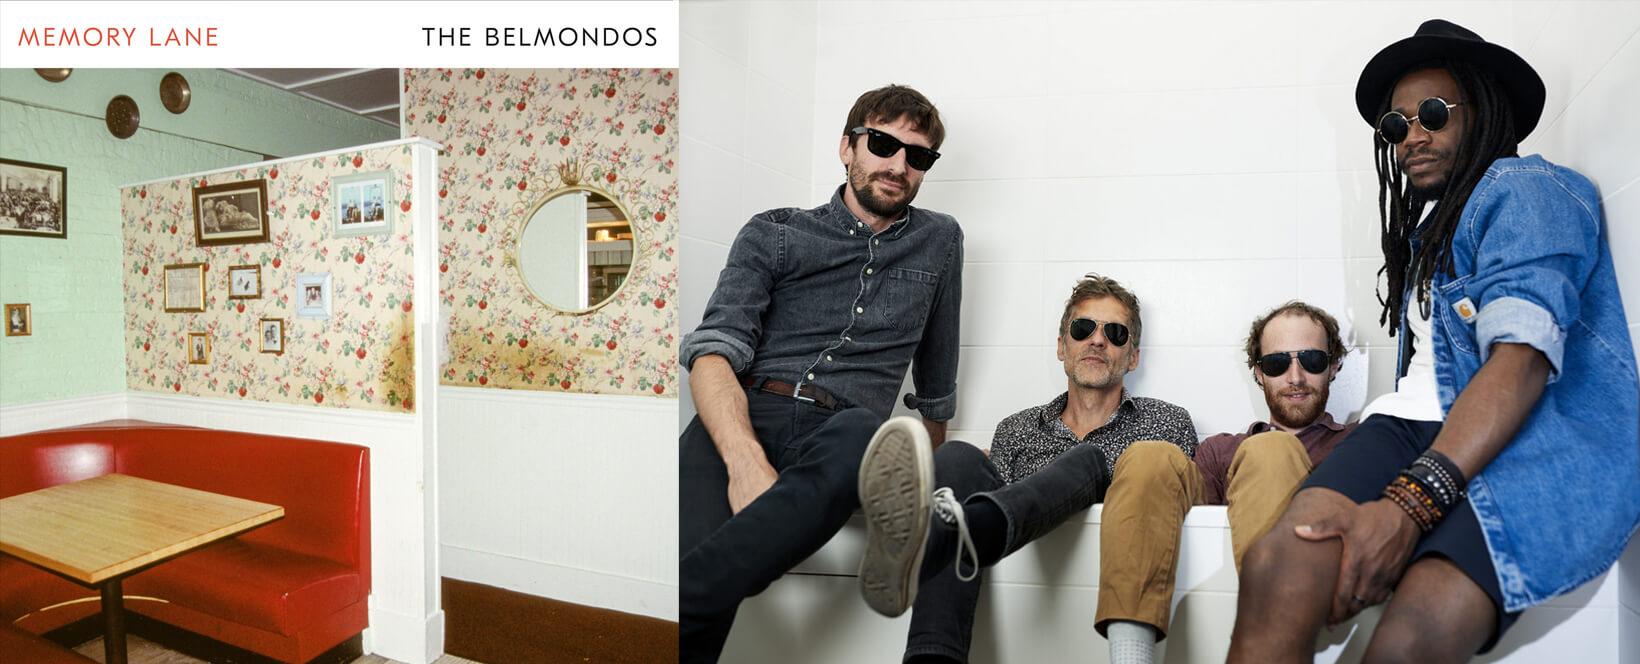 BC-356-Album - Belmondos : Memory lane - Radio Galaxie 98.5FM